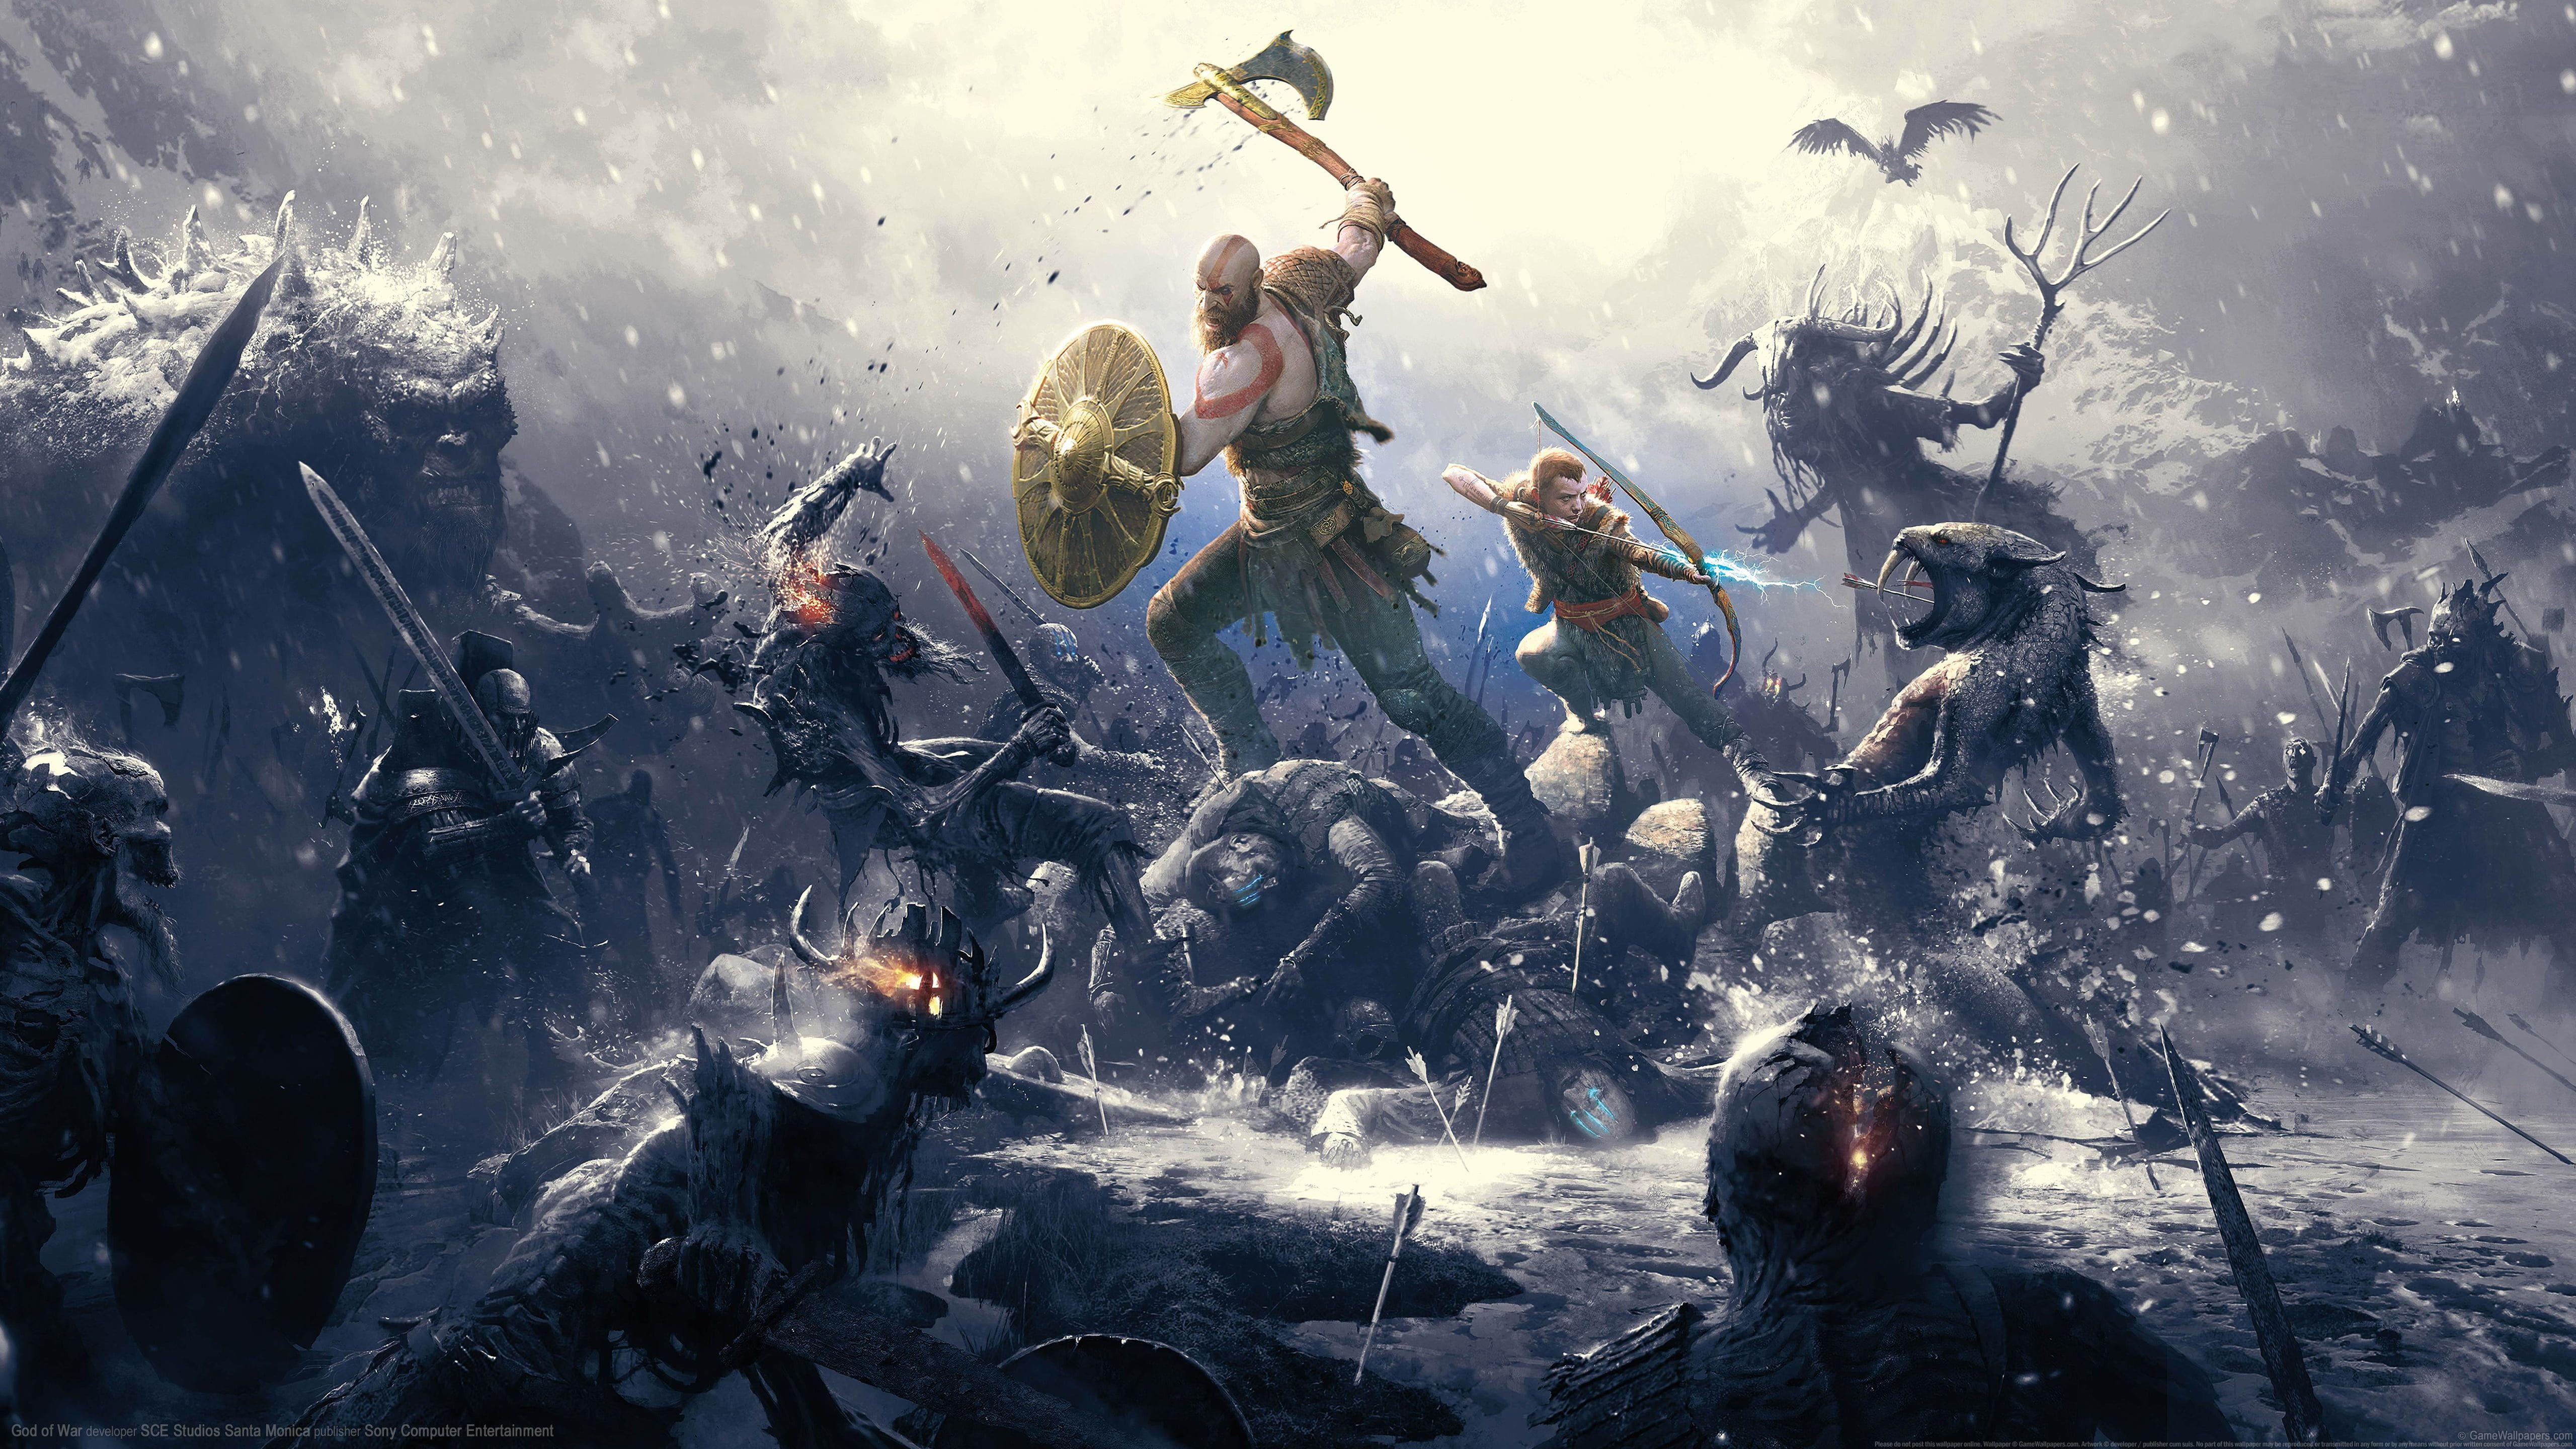 God Of War God Of War 2018 Digital Art Video Game Art Video Games Kratos 5k Wallpaper Hdwallpaper D Digital Art Videos Game Art Video Game Art Wallpaper